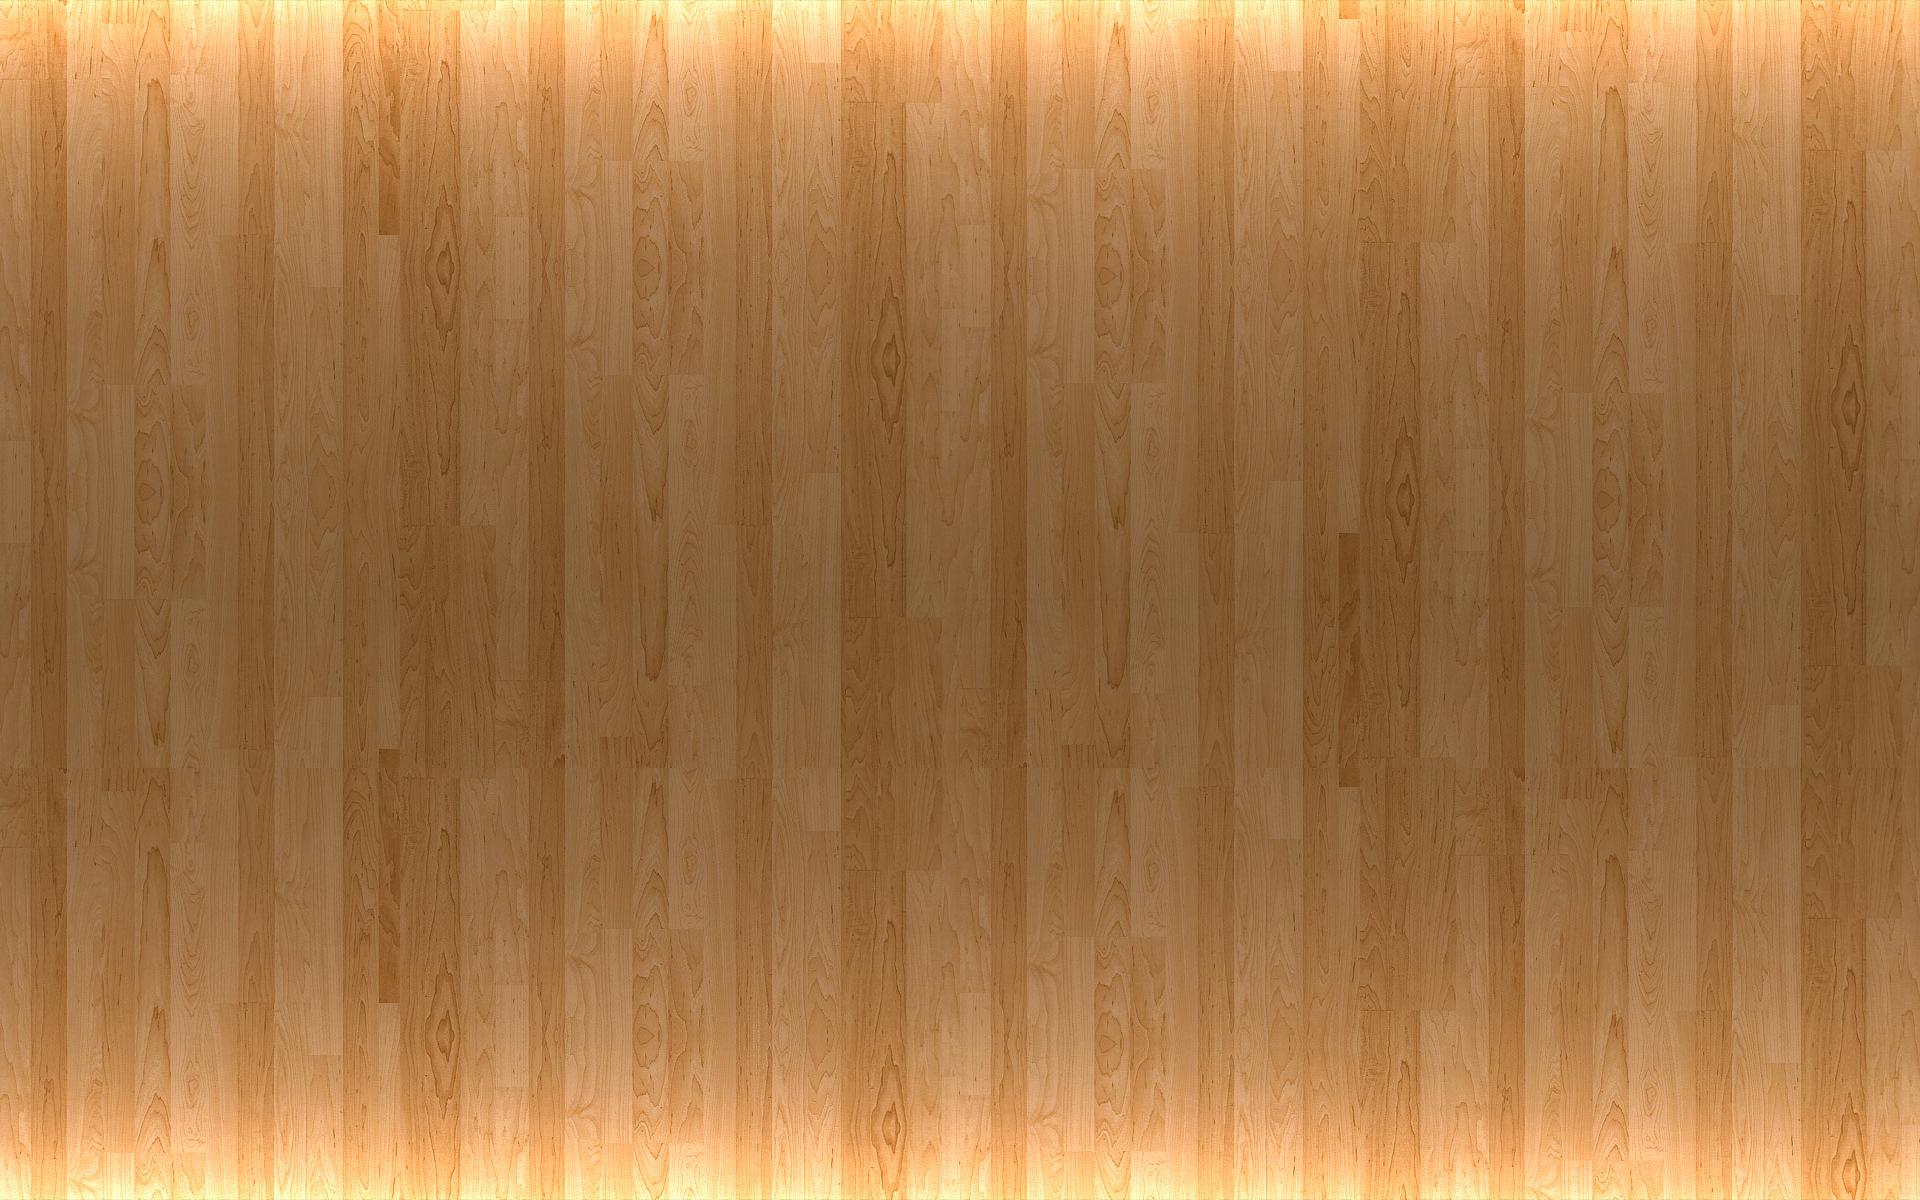 pattern wood patterns wallpaper 1920x1200 7984